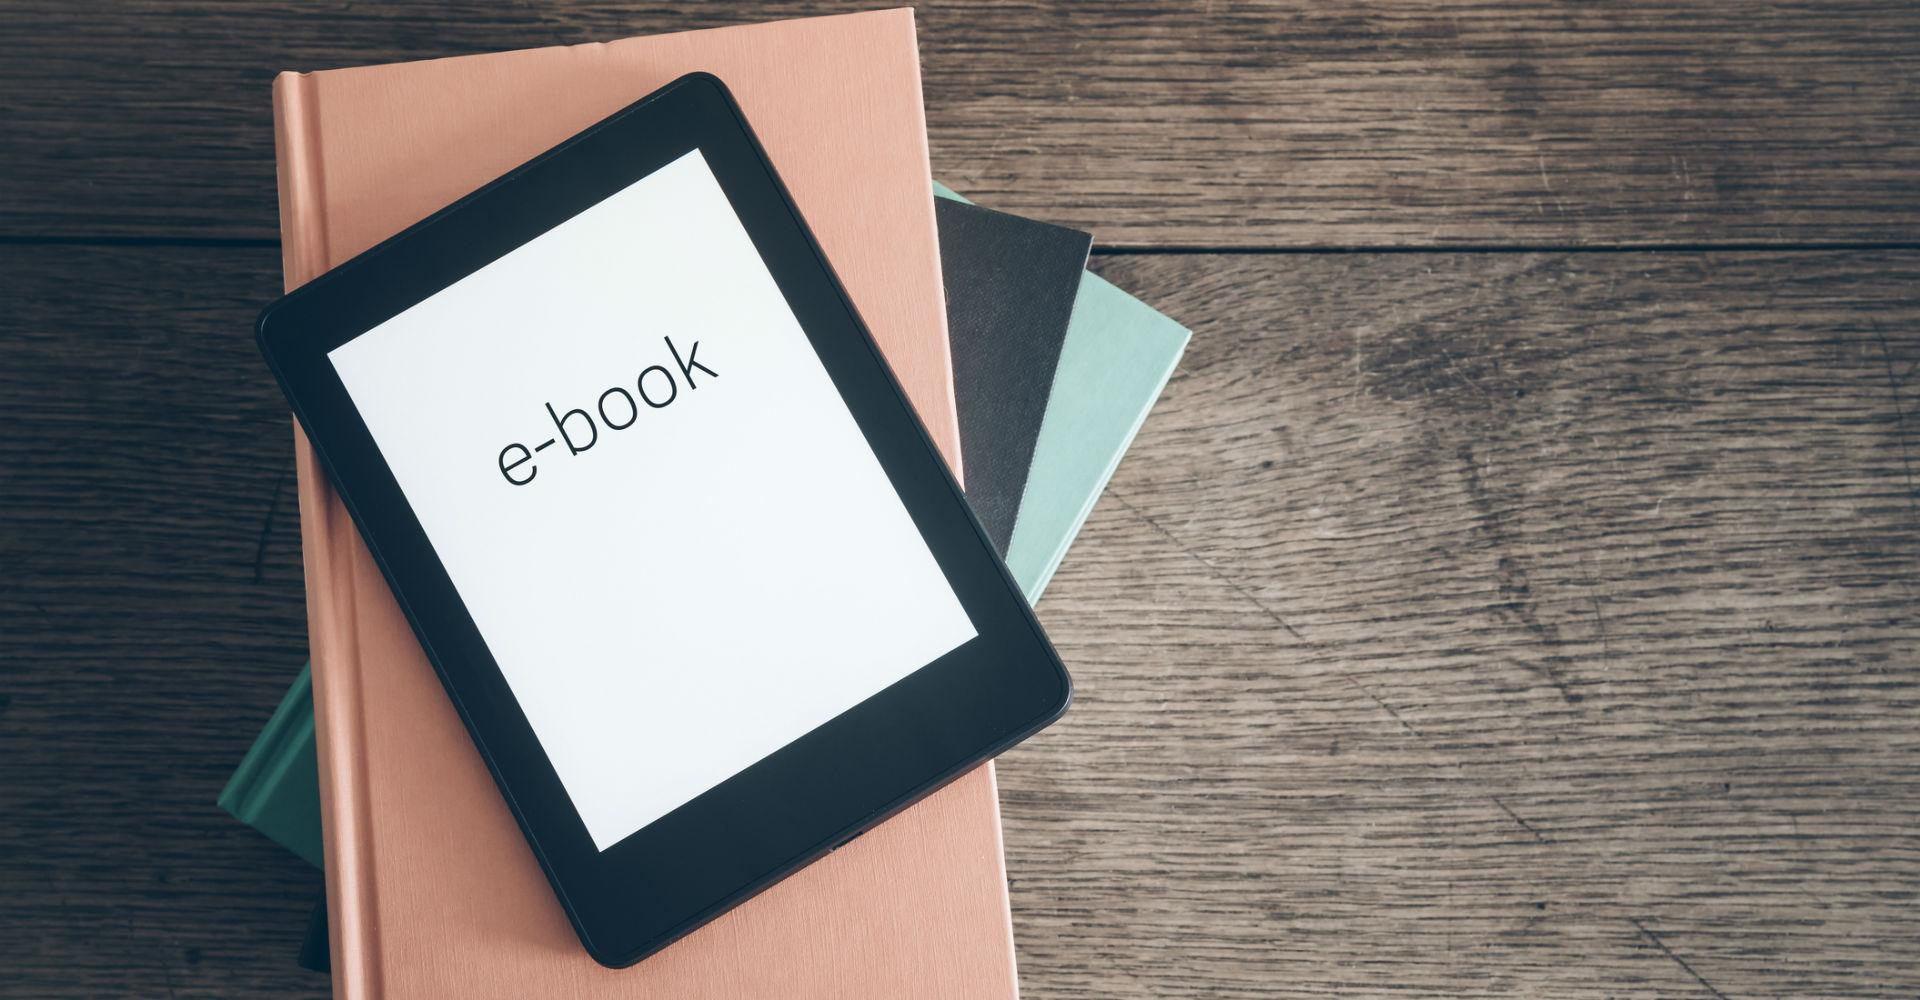 E-Book auf dem Tablet lesen.